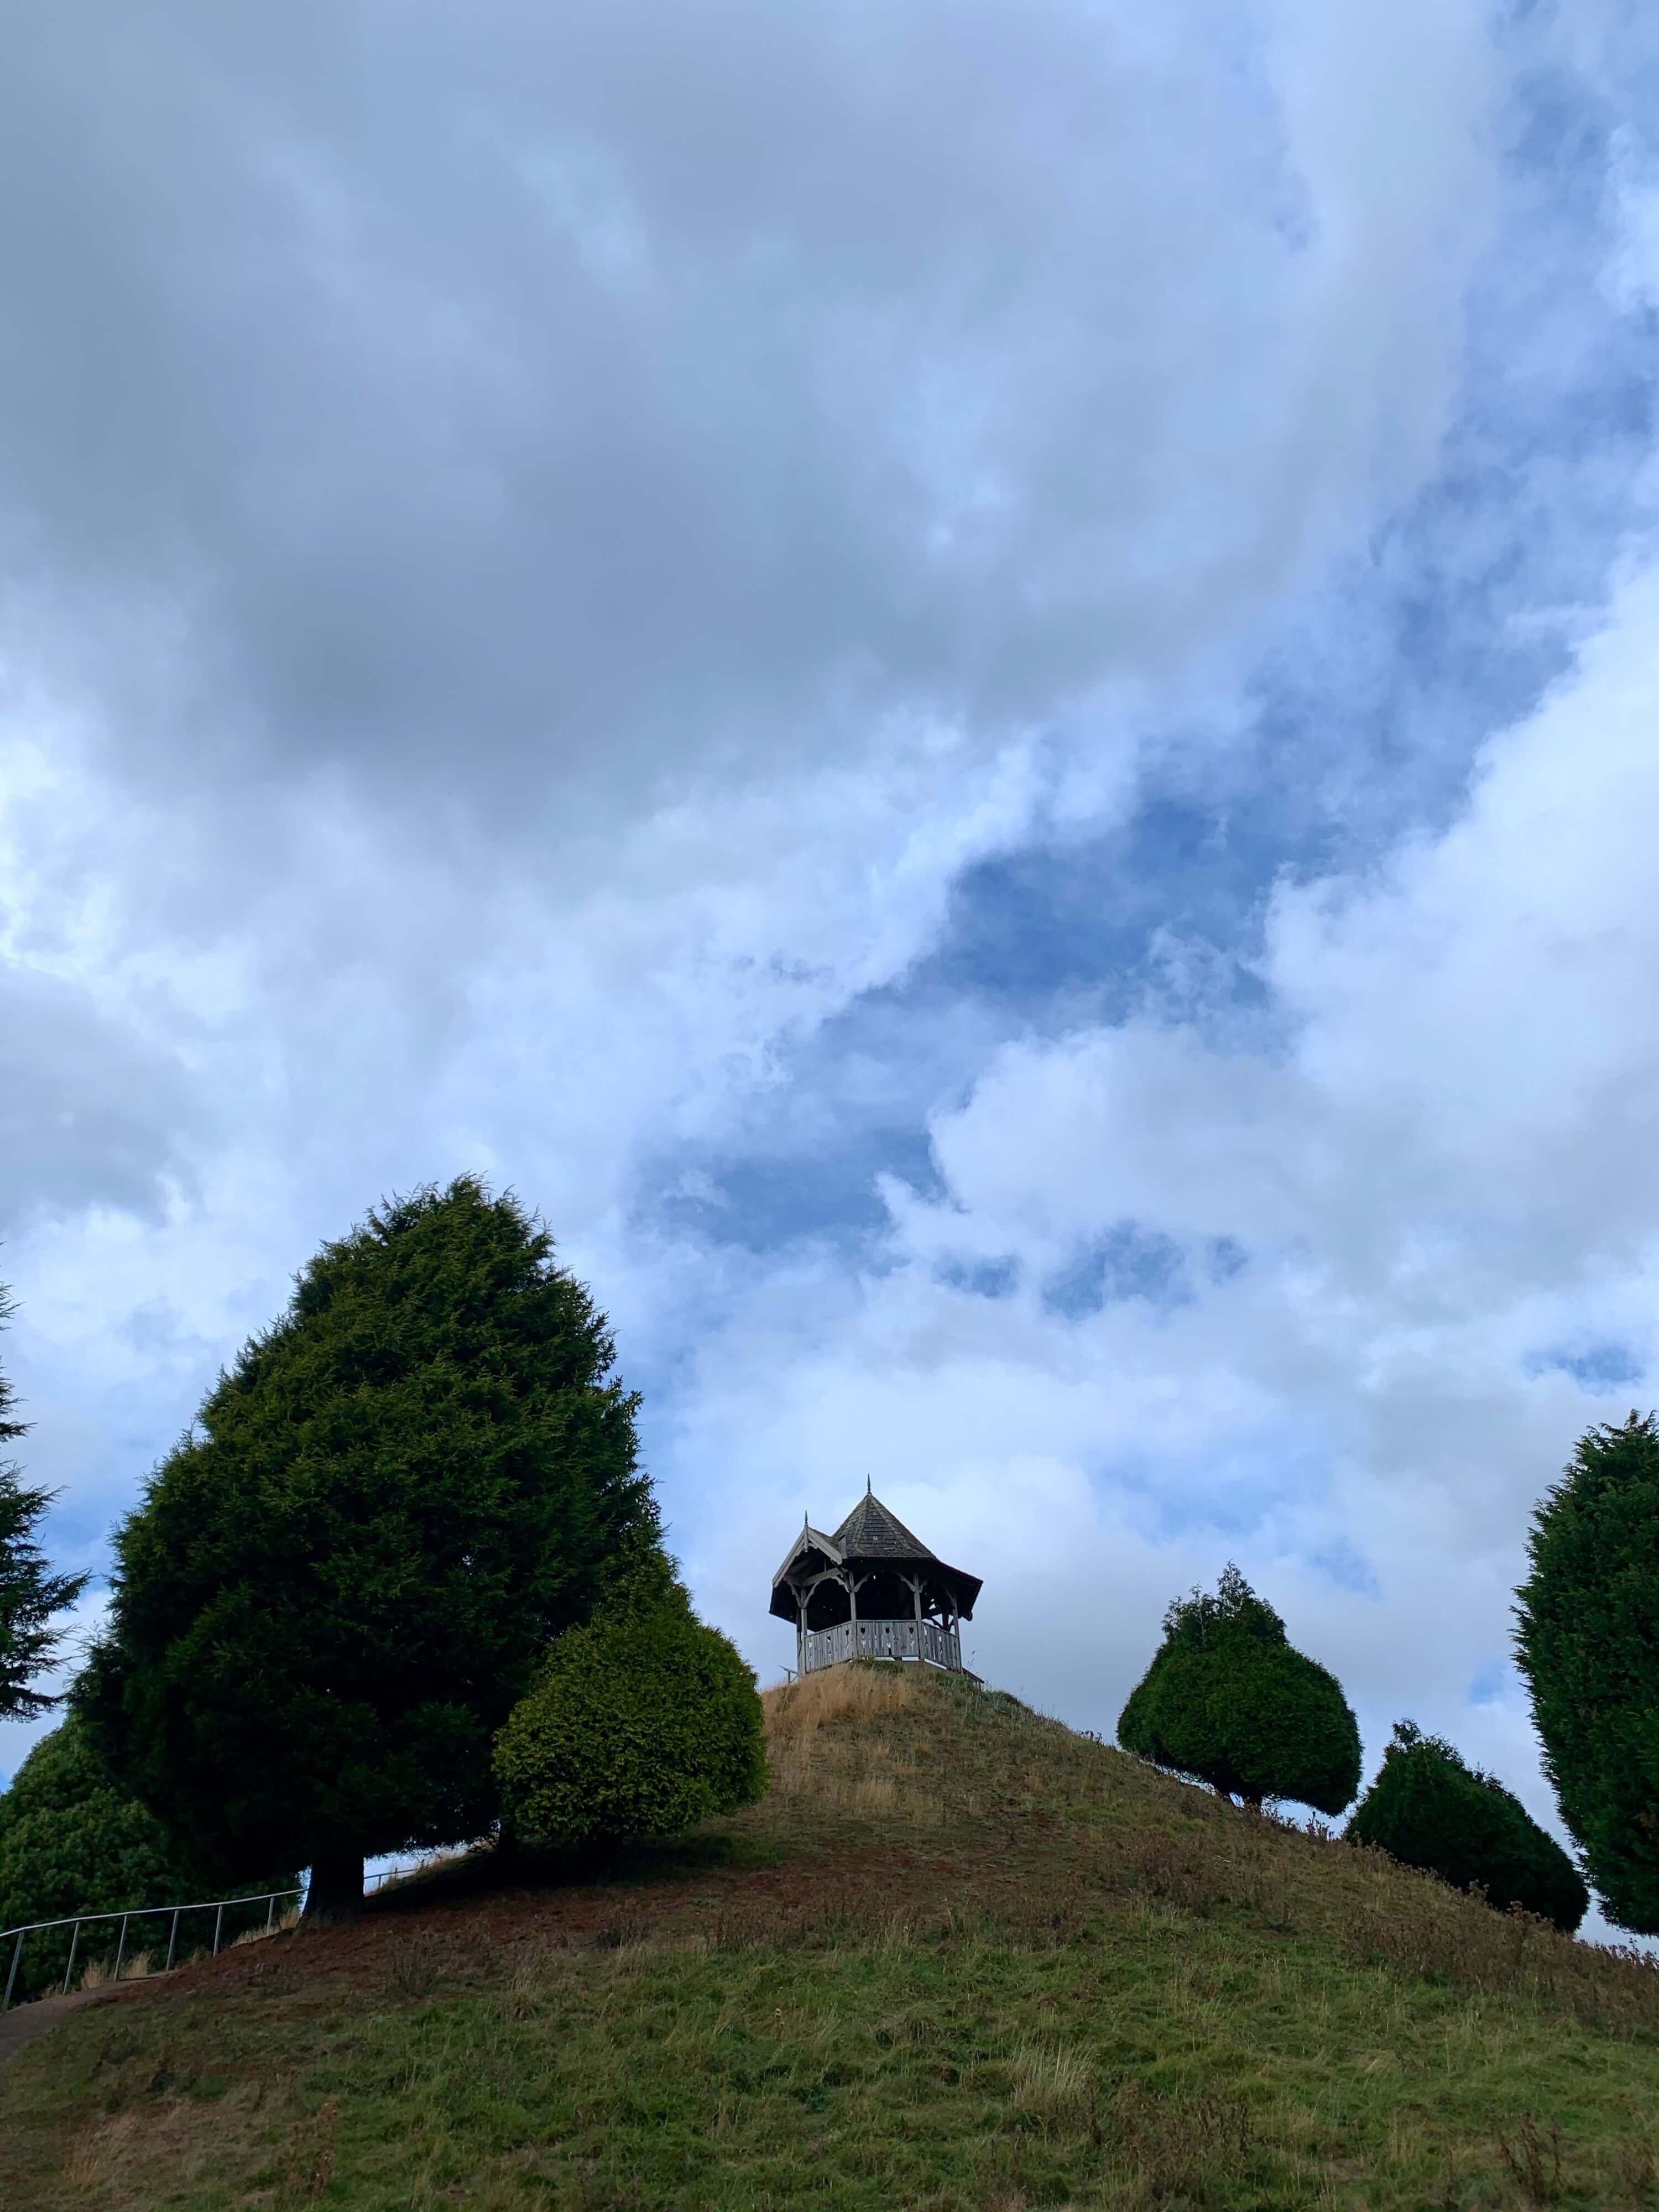 viewpoint on a small hill, Grindlewald, Launceston, Tasmania